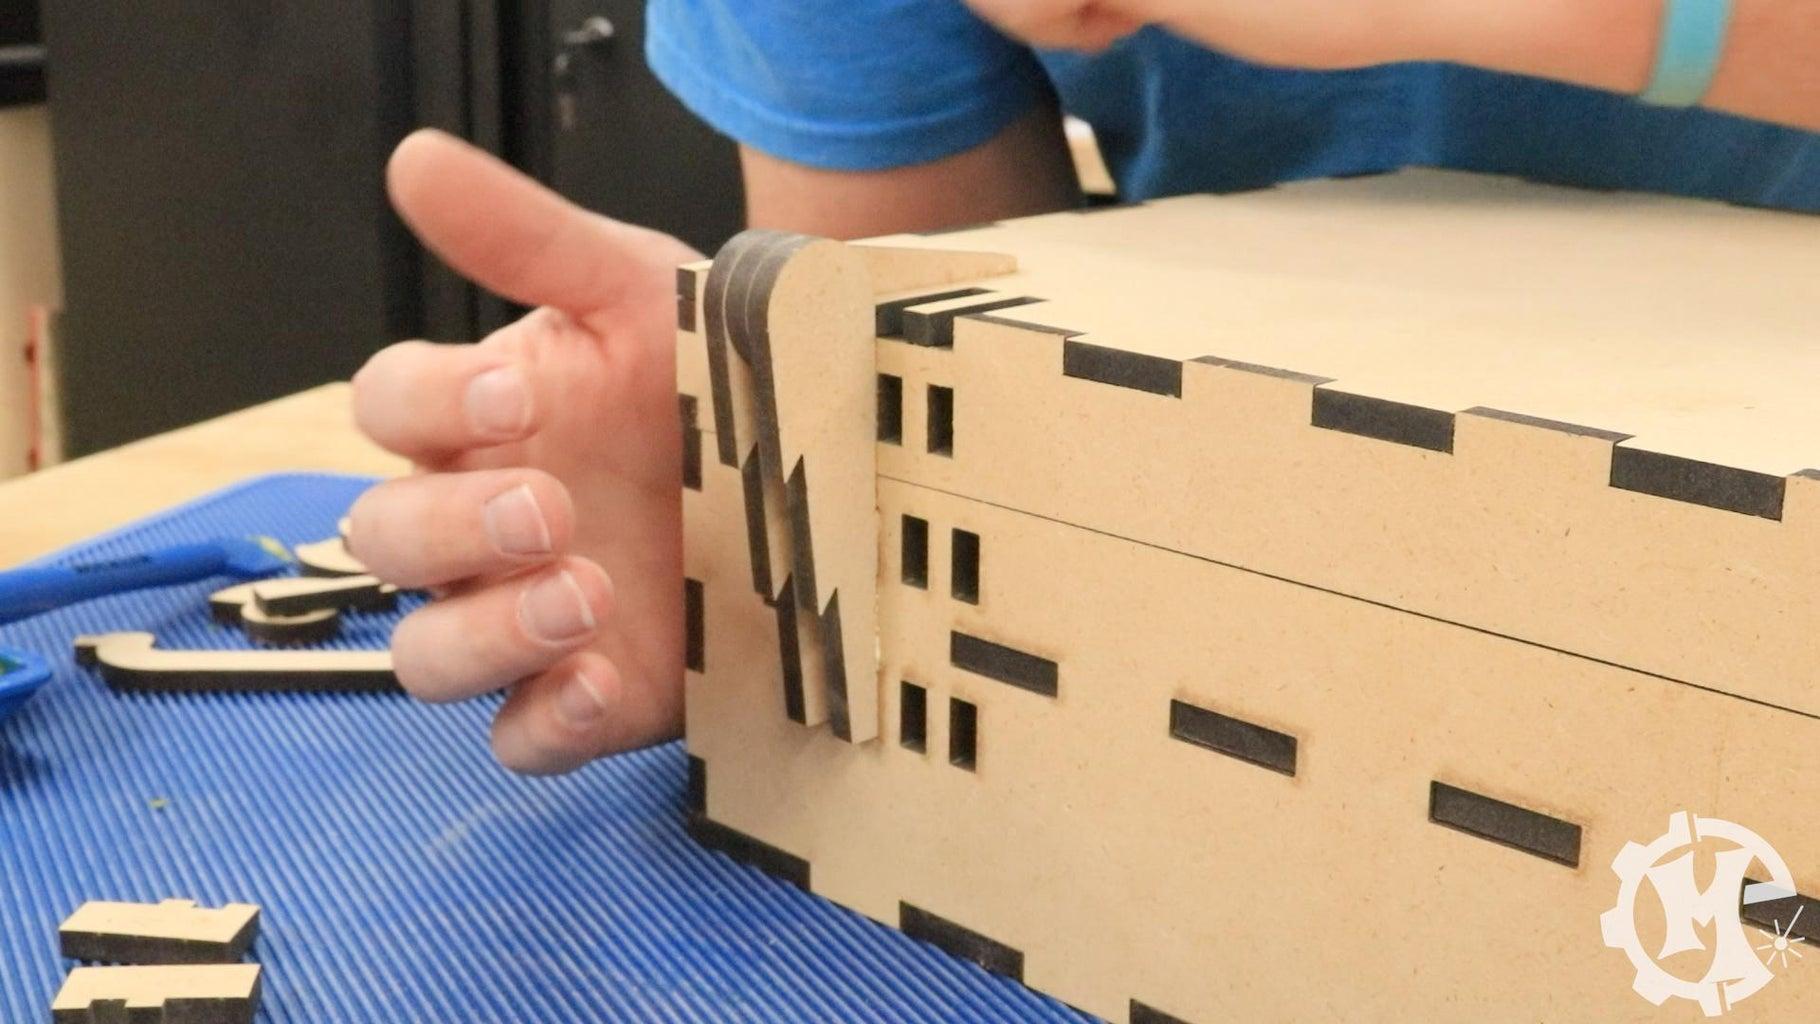 Assemble the Box - Case/Hinge Assembly